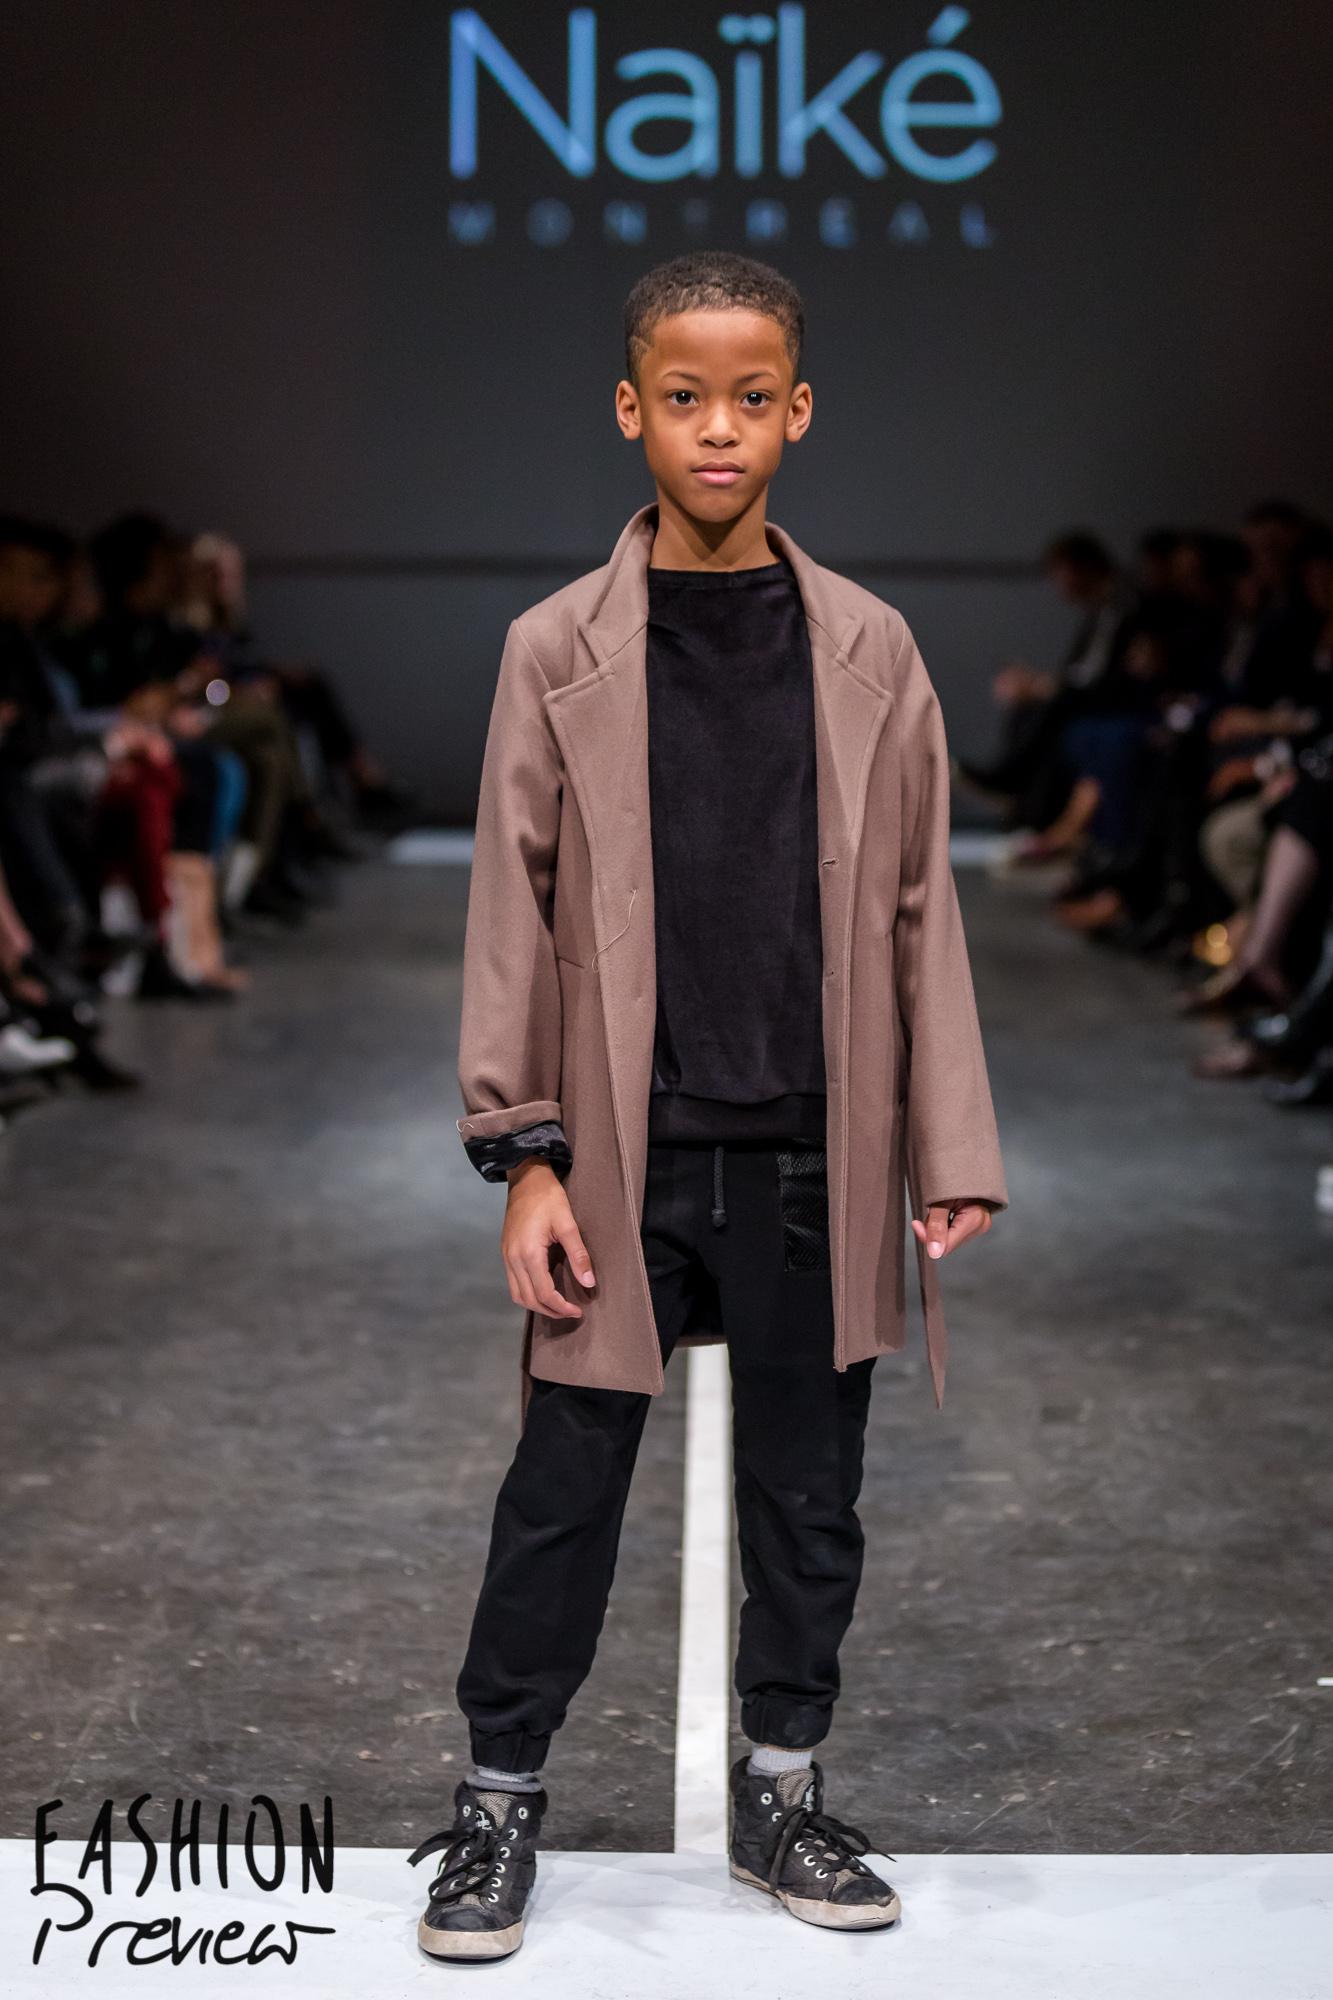 Fashion Preview 9 - Naike-23.jpg